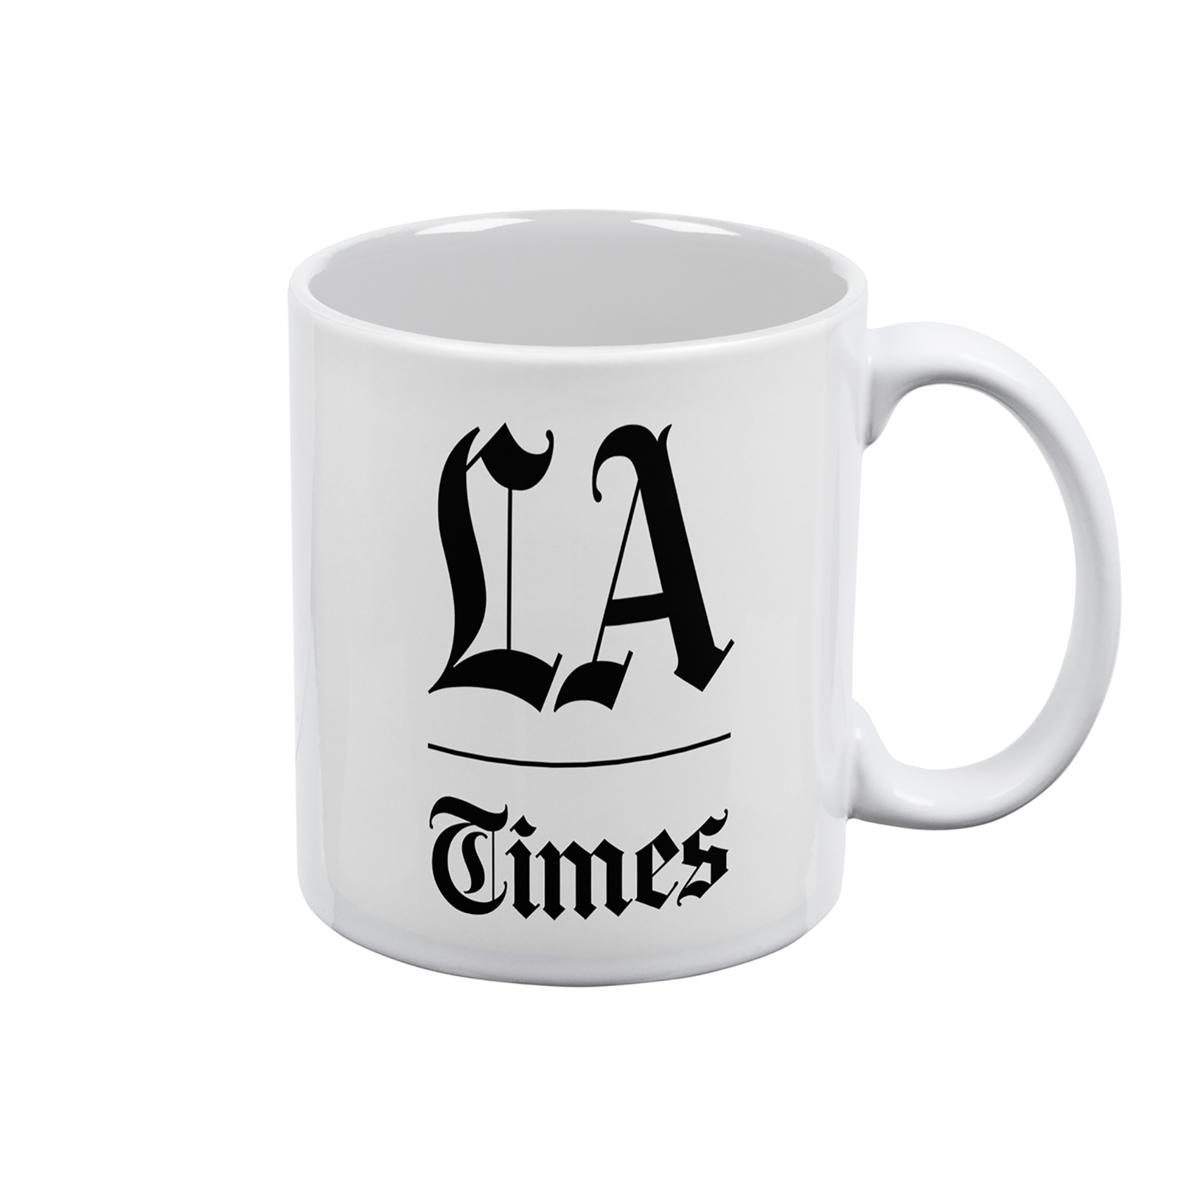 Los Angeles Times Stacked Logo White Mug